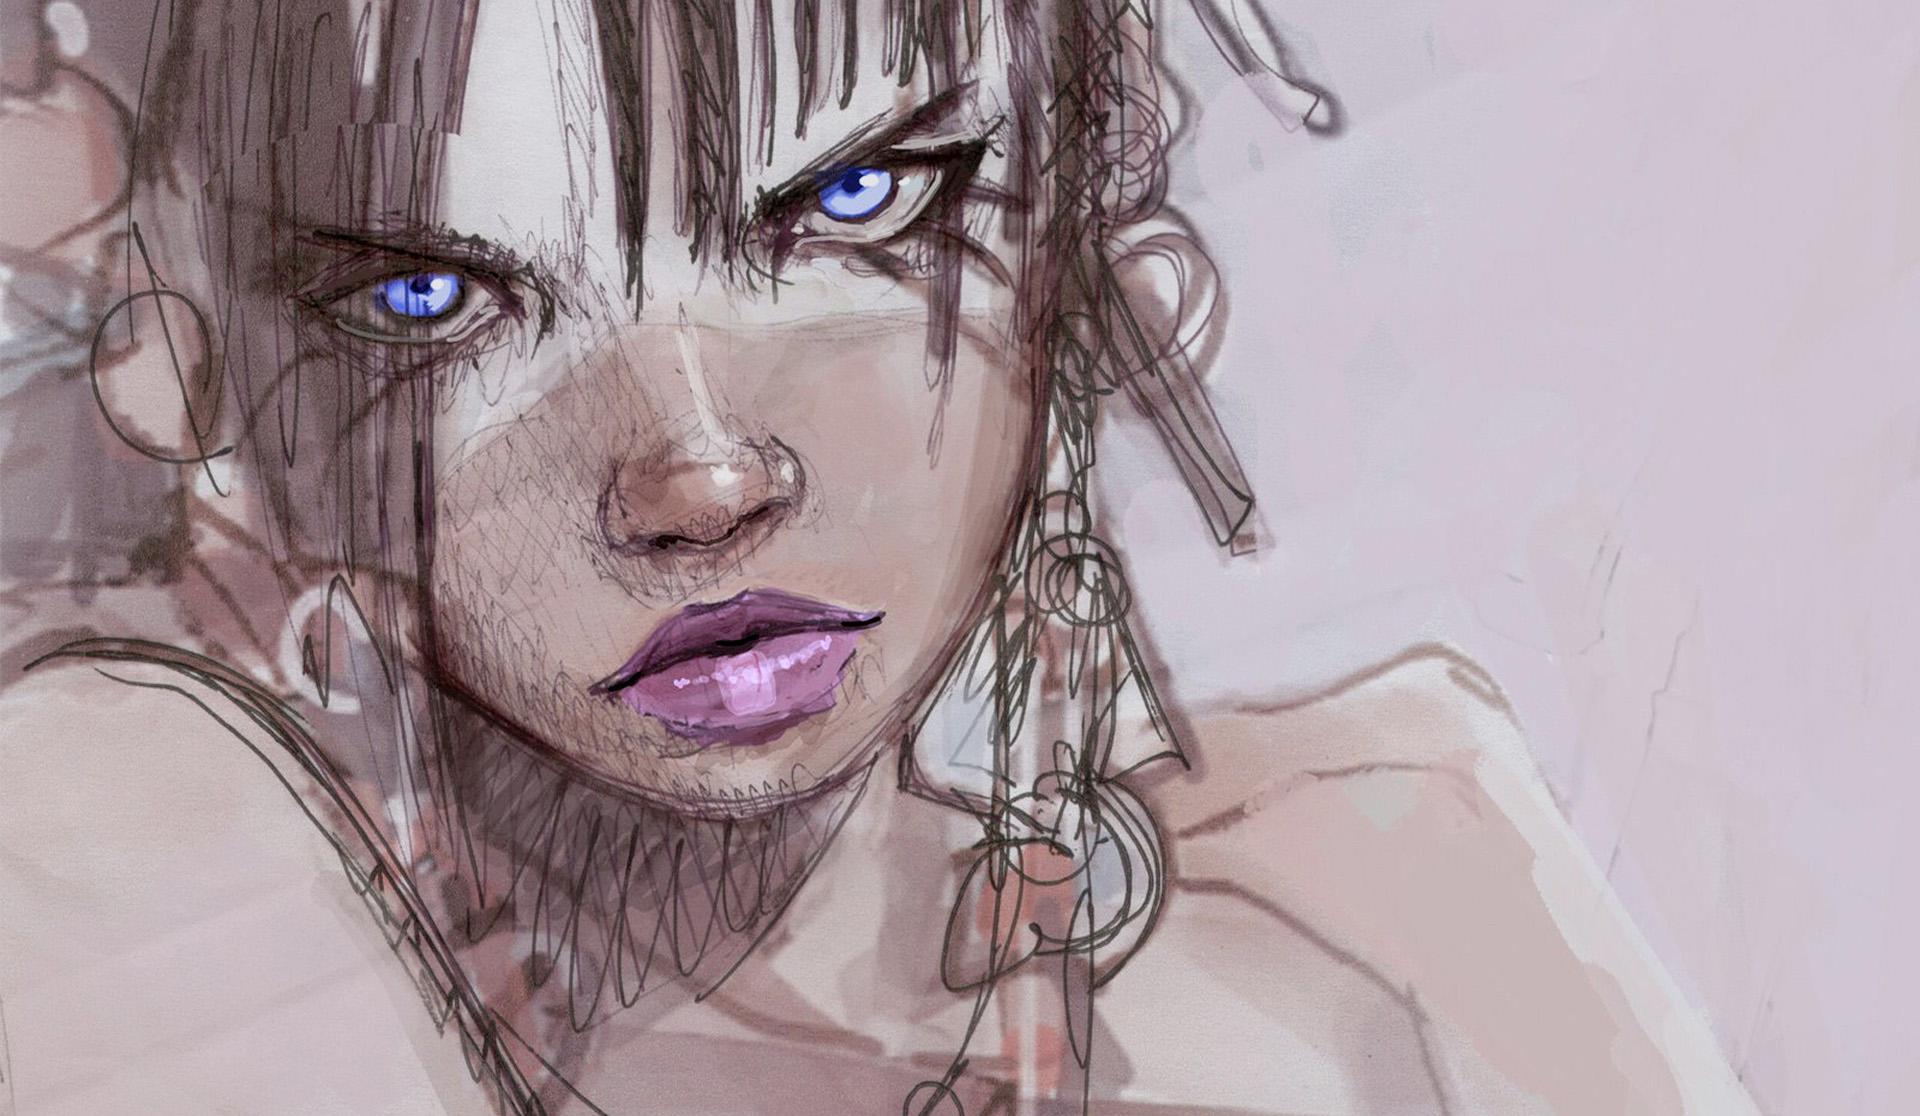 Wallpaper : Face, Portrait, Mouth, Head, Sketch Up, ART